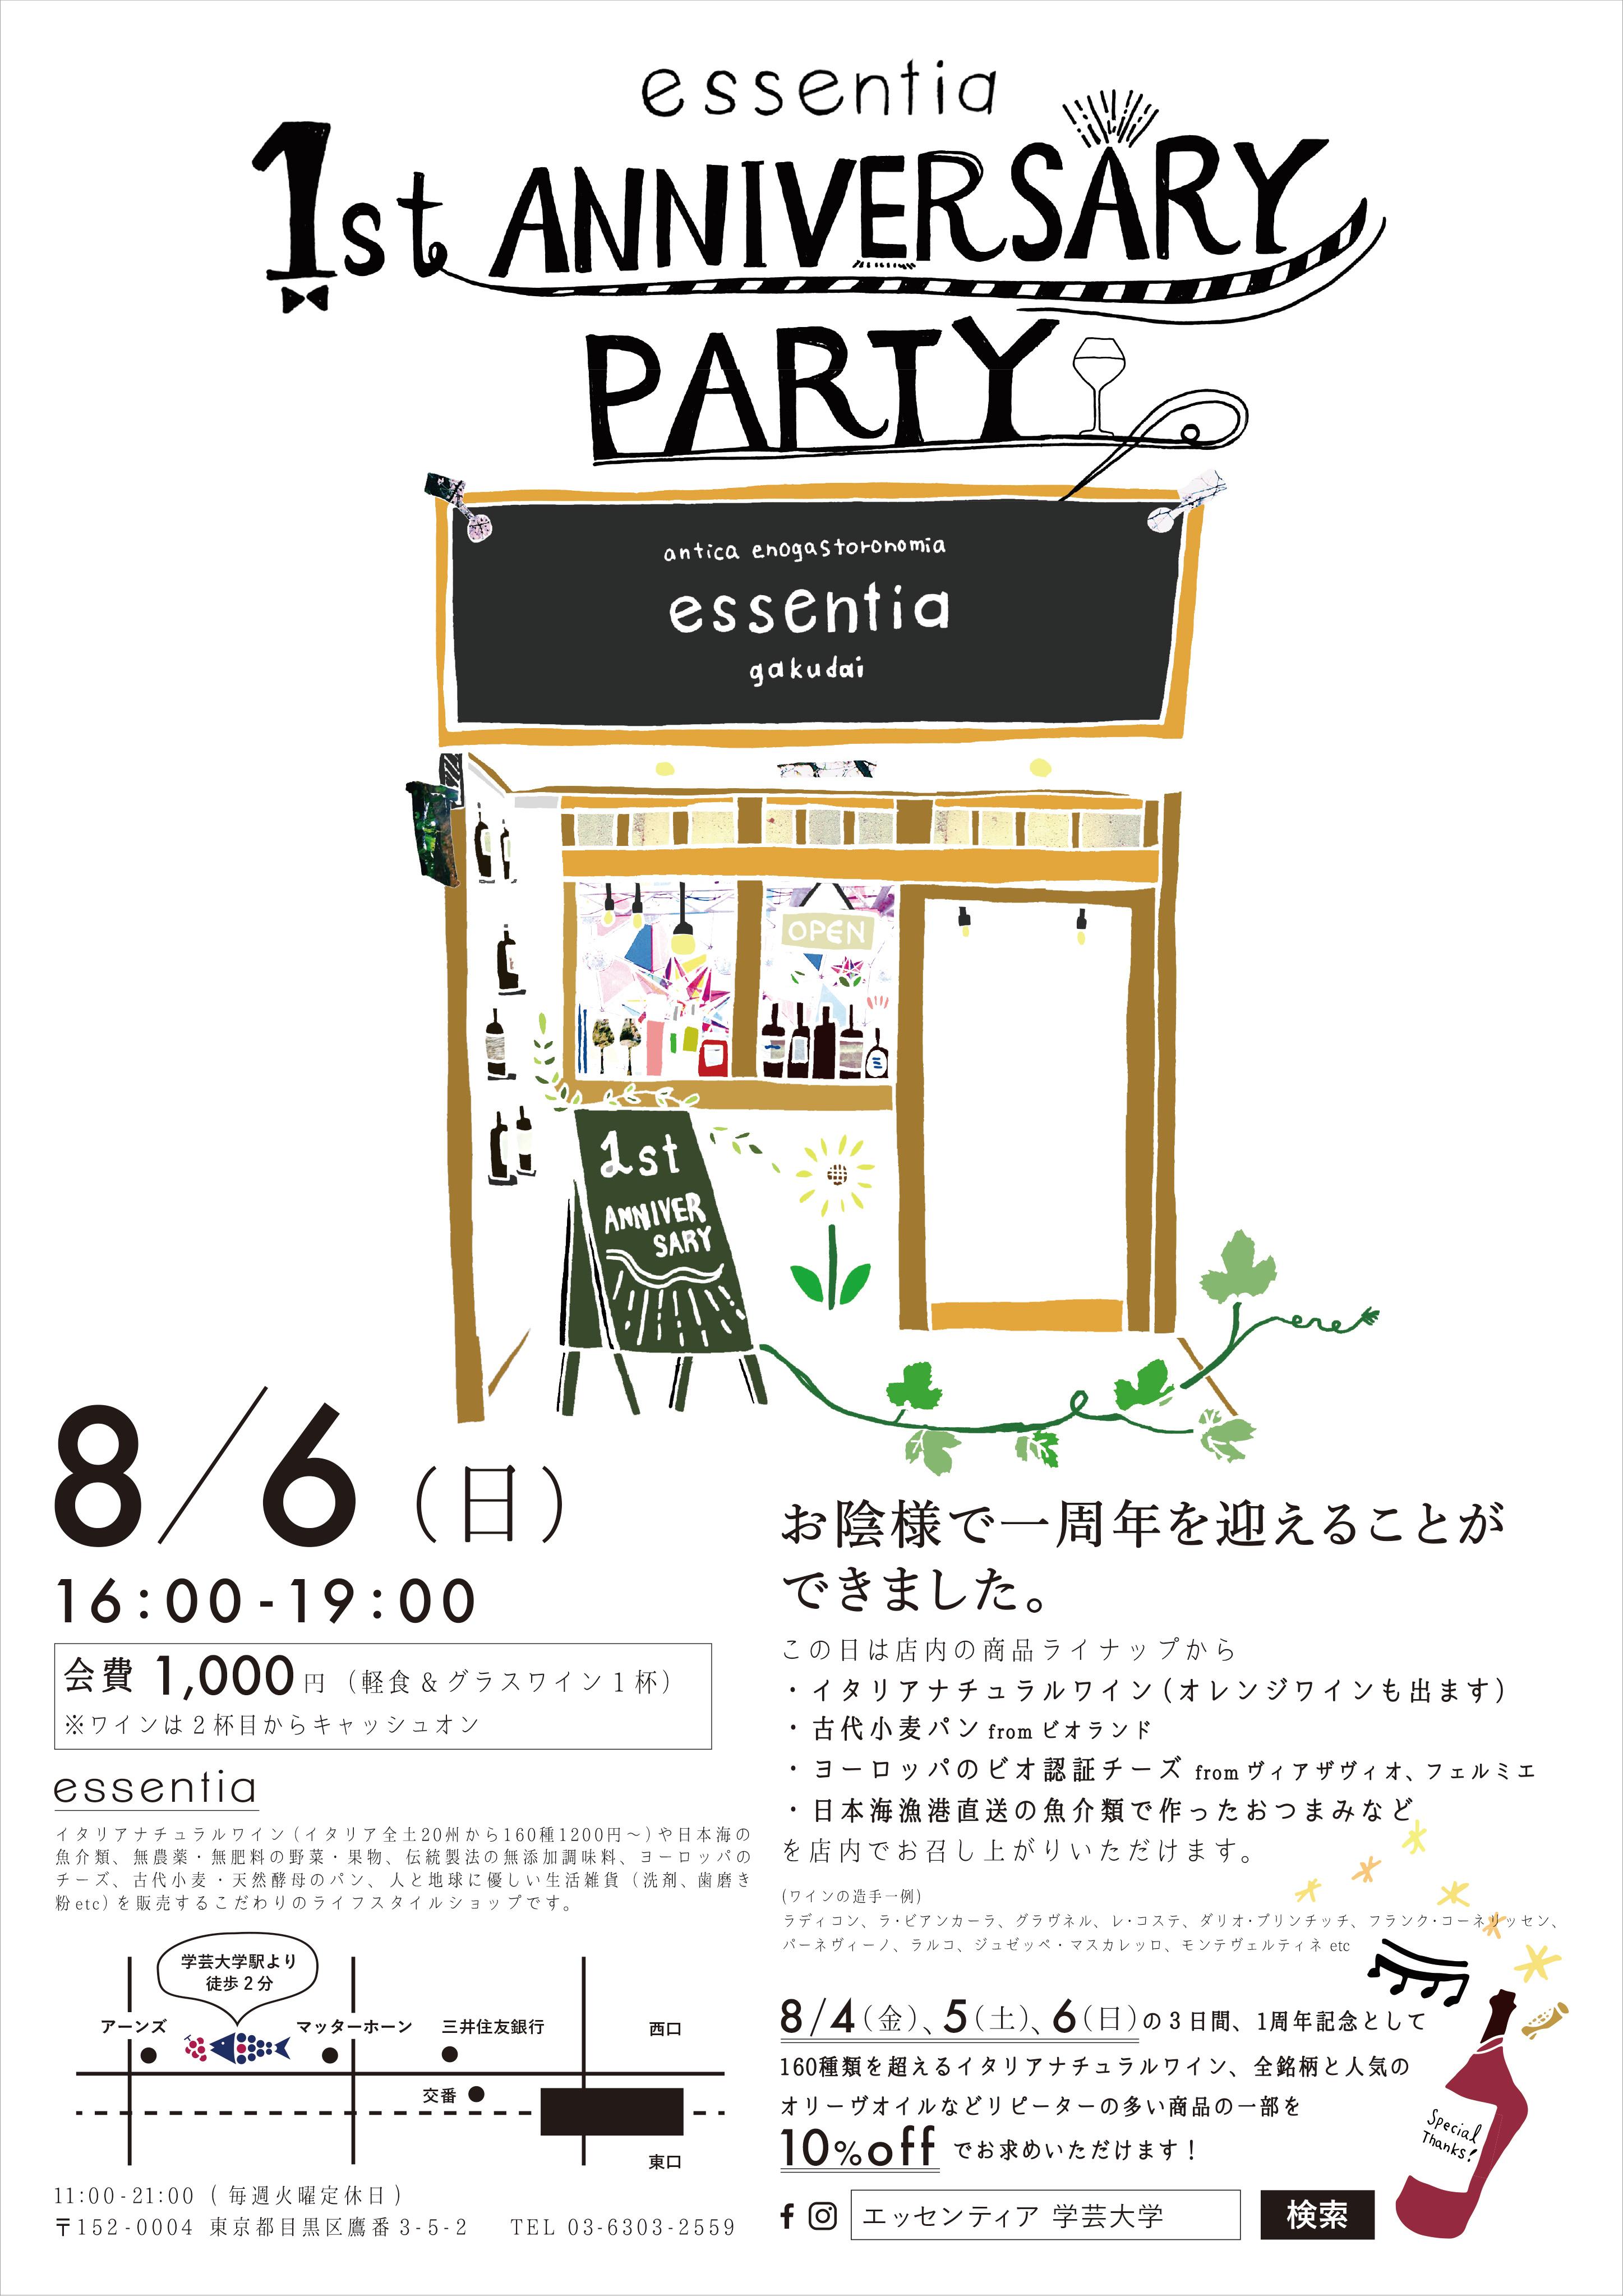 essentia一周年記念party flyer design